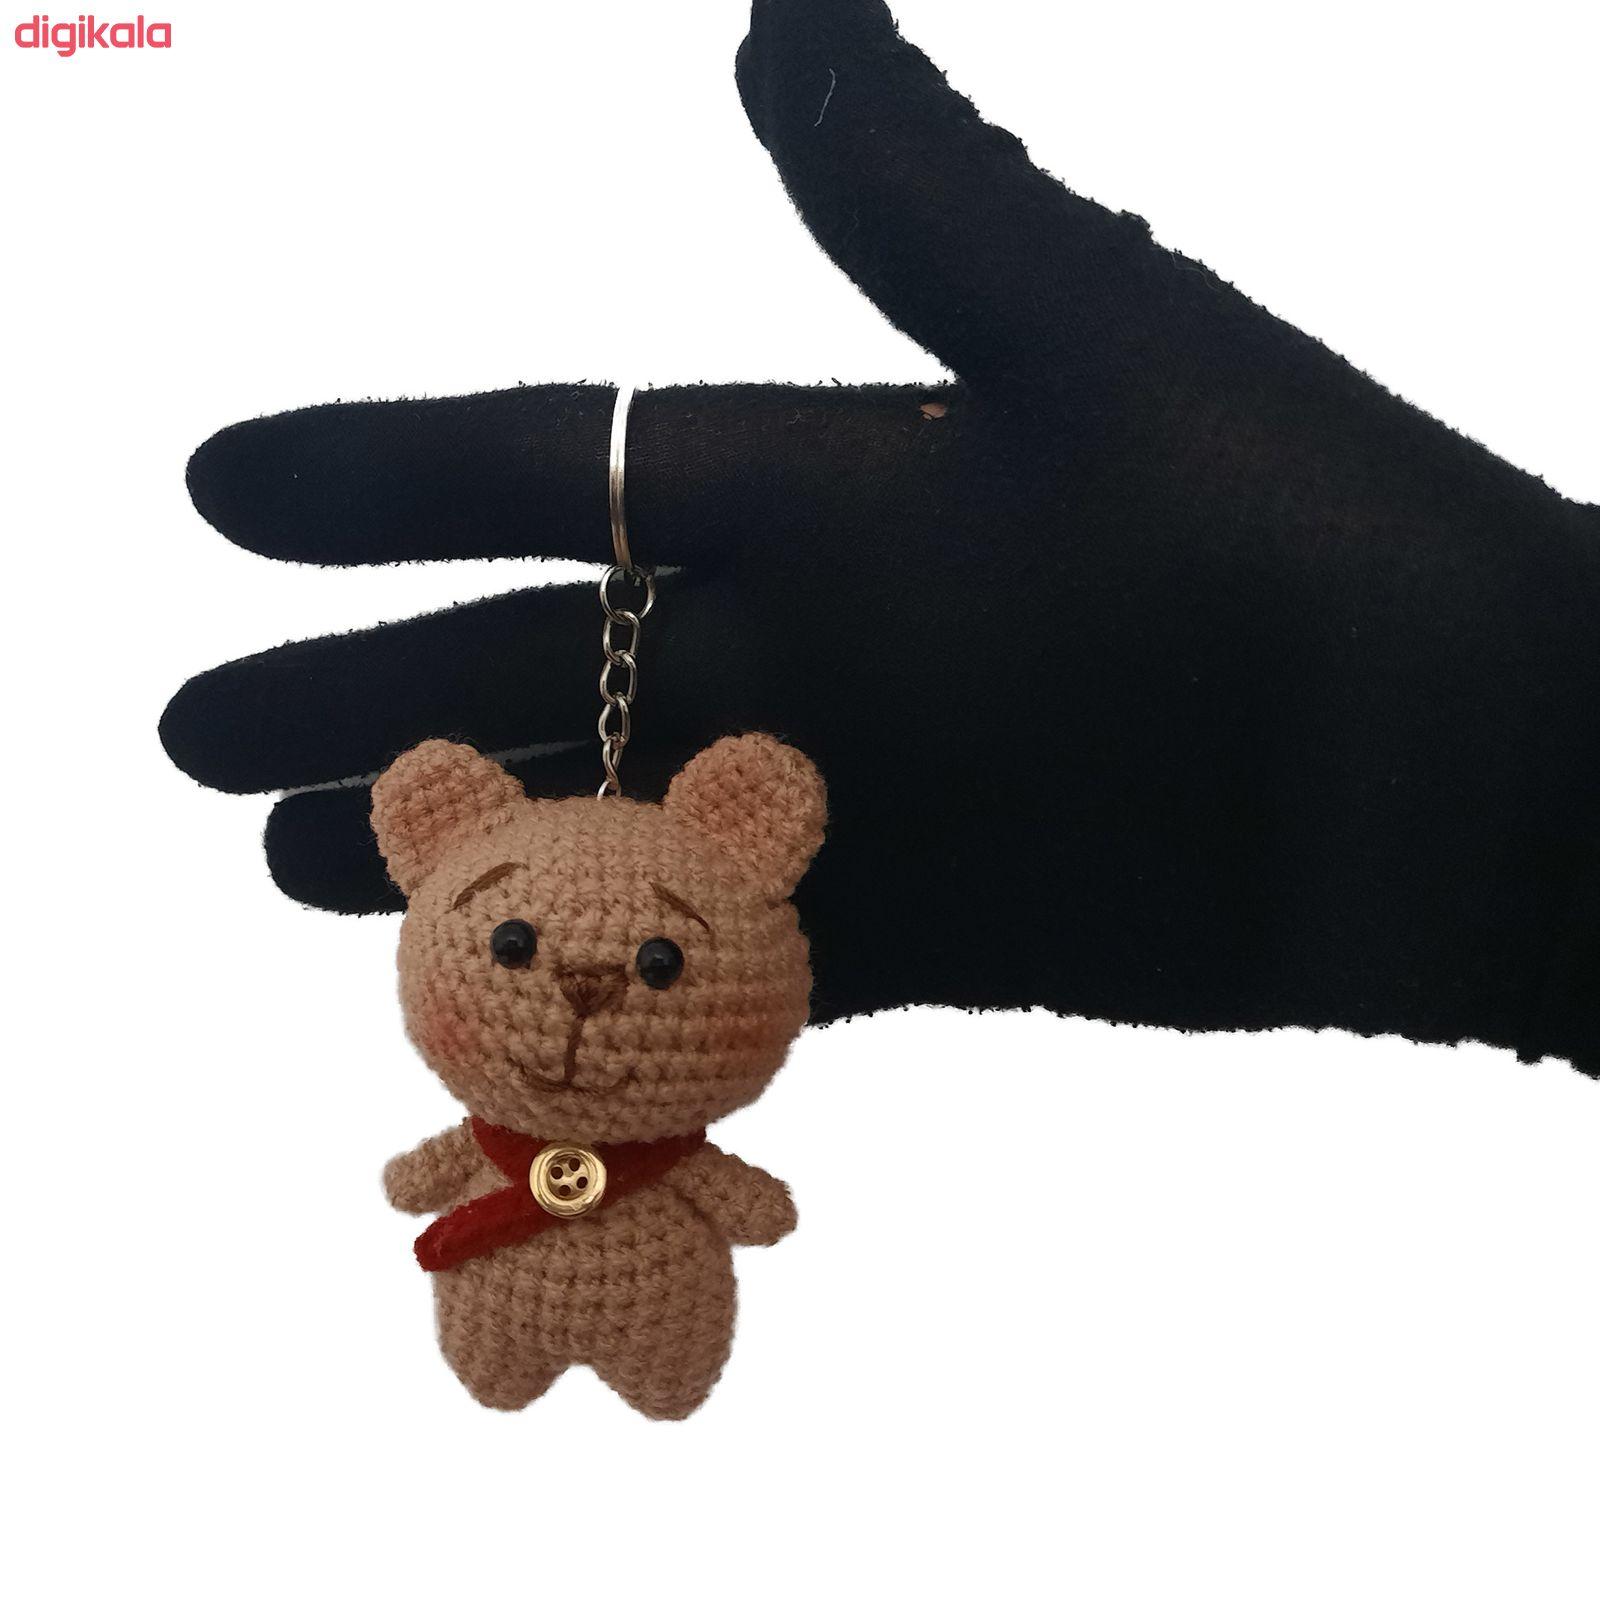 عروسک بافتنی مدل خرس کد 001